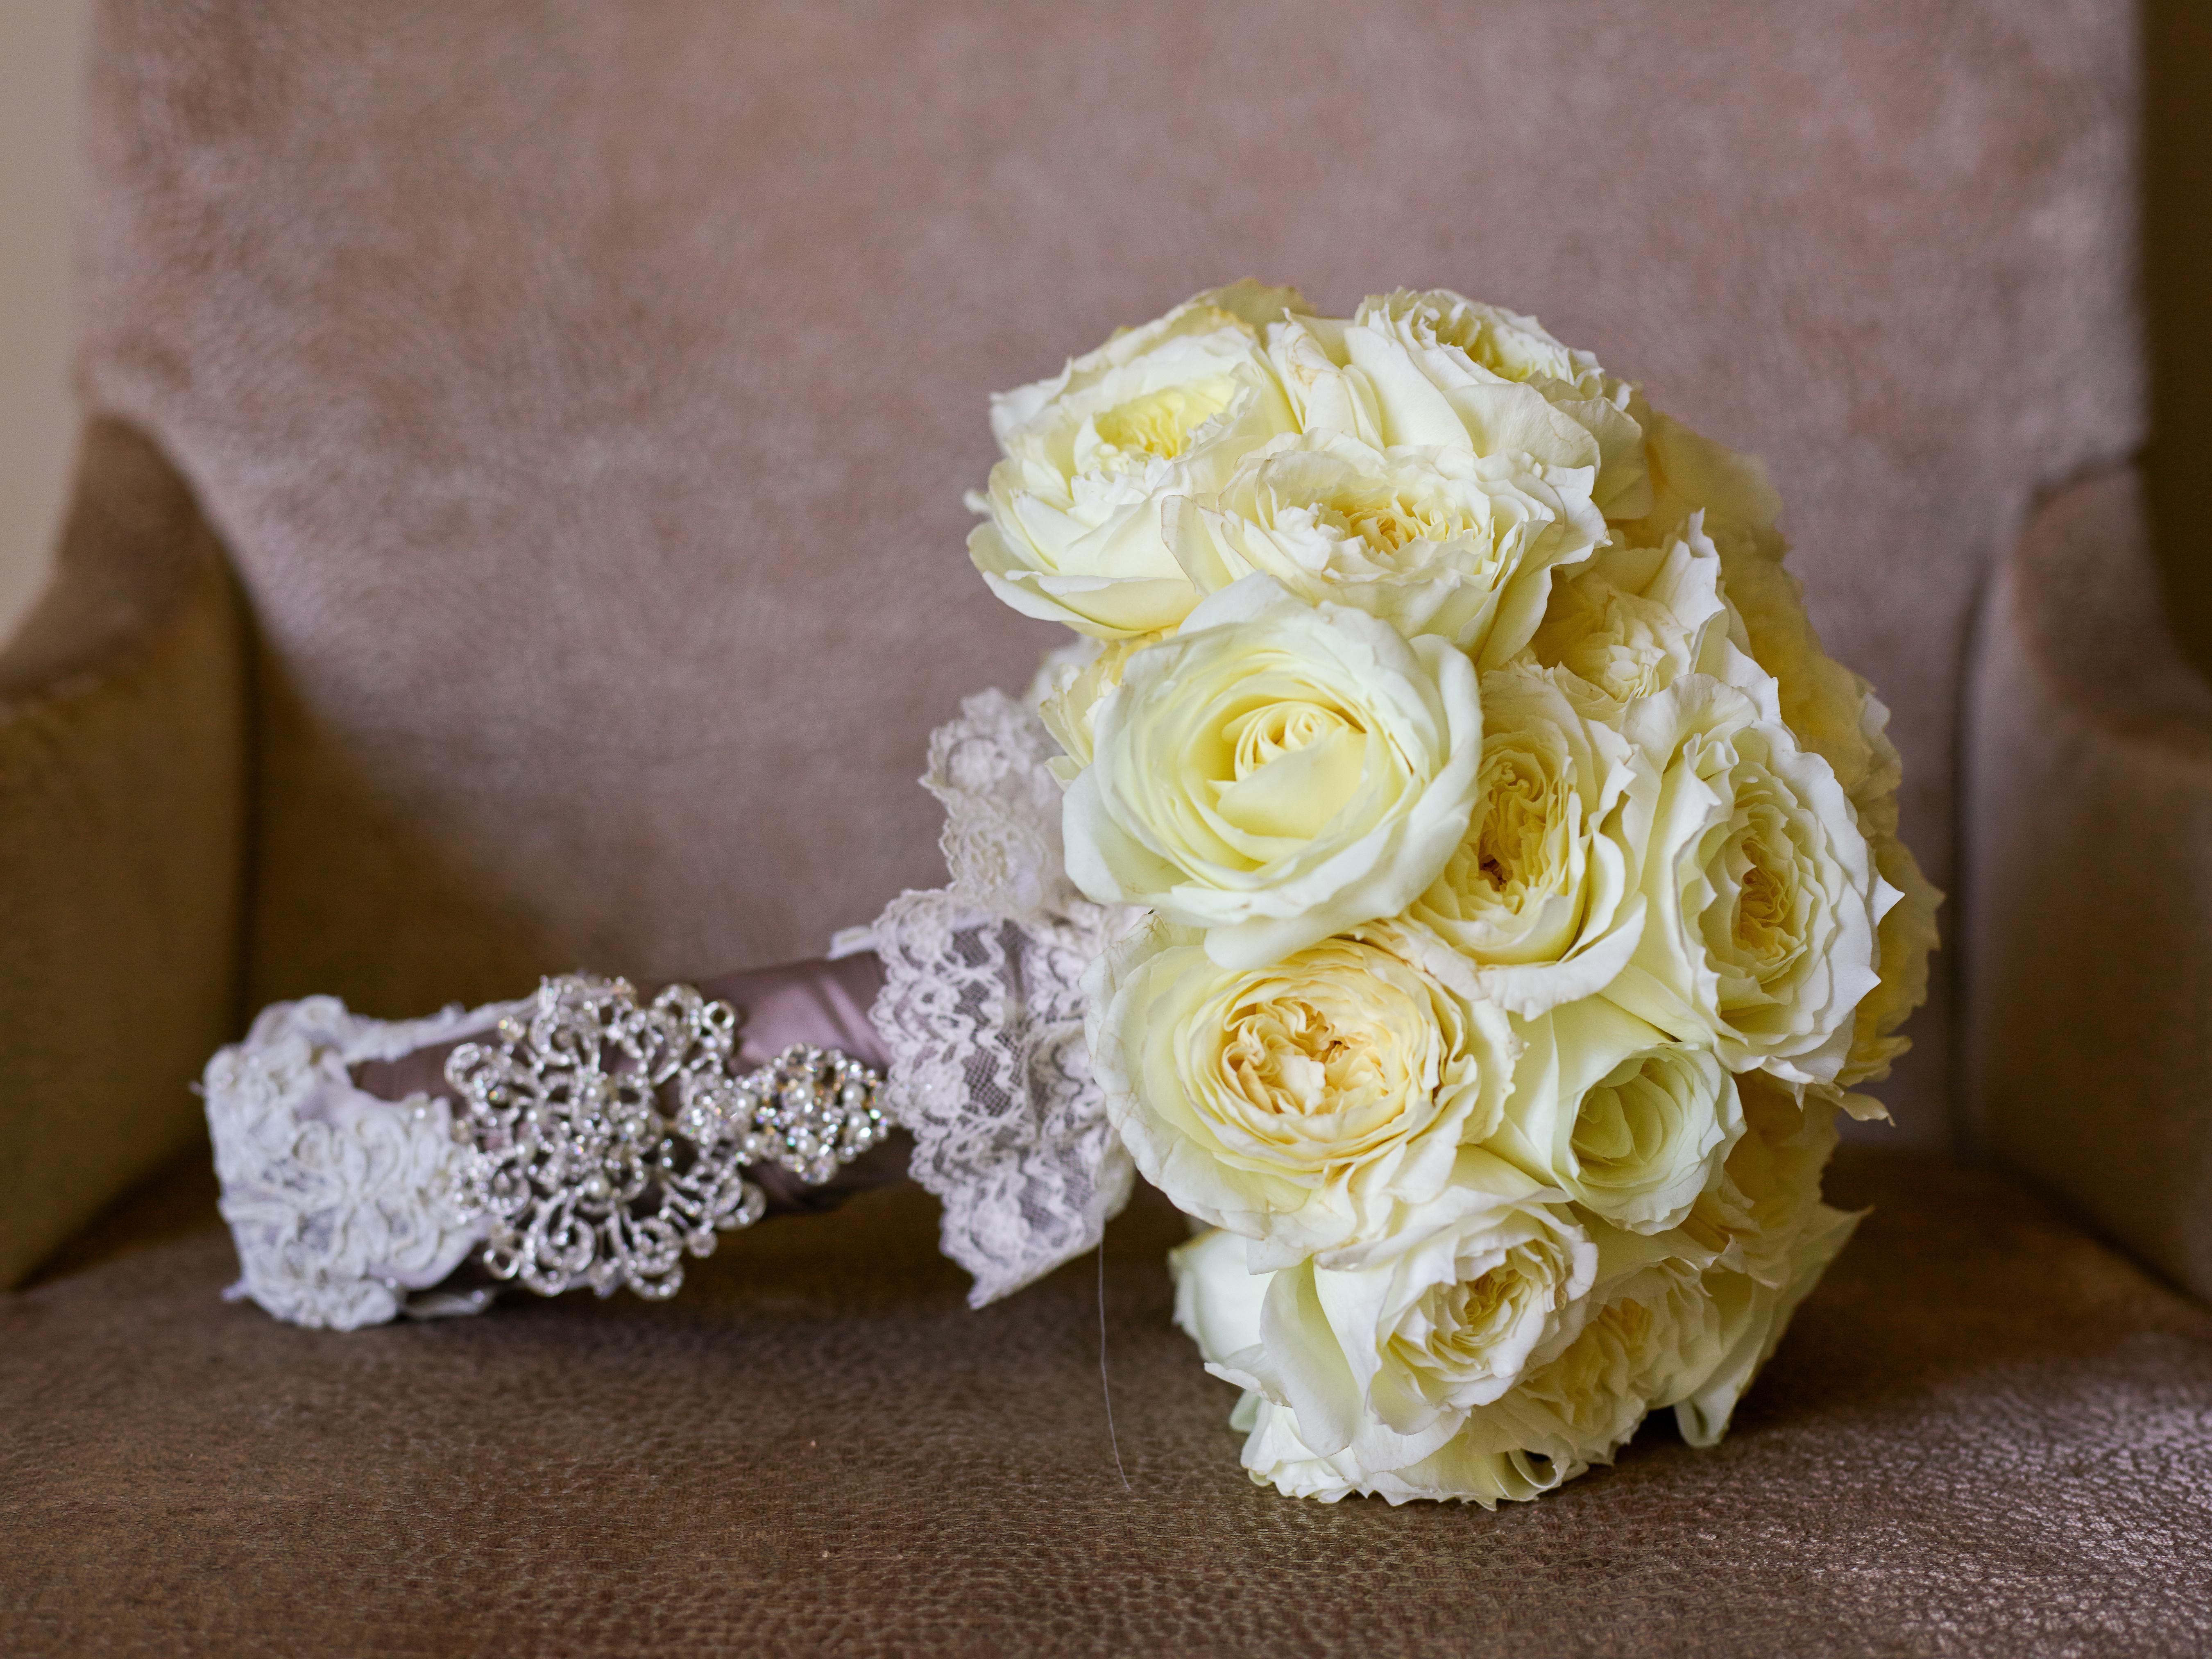 How to save money on your wedding flowers huffpost life 2015 09 09 1441814216 5960838 justineungarophotography2g izmirmasajfo